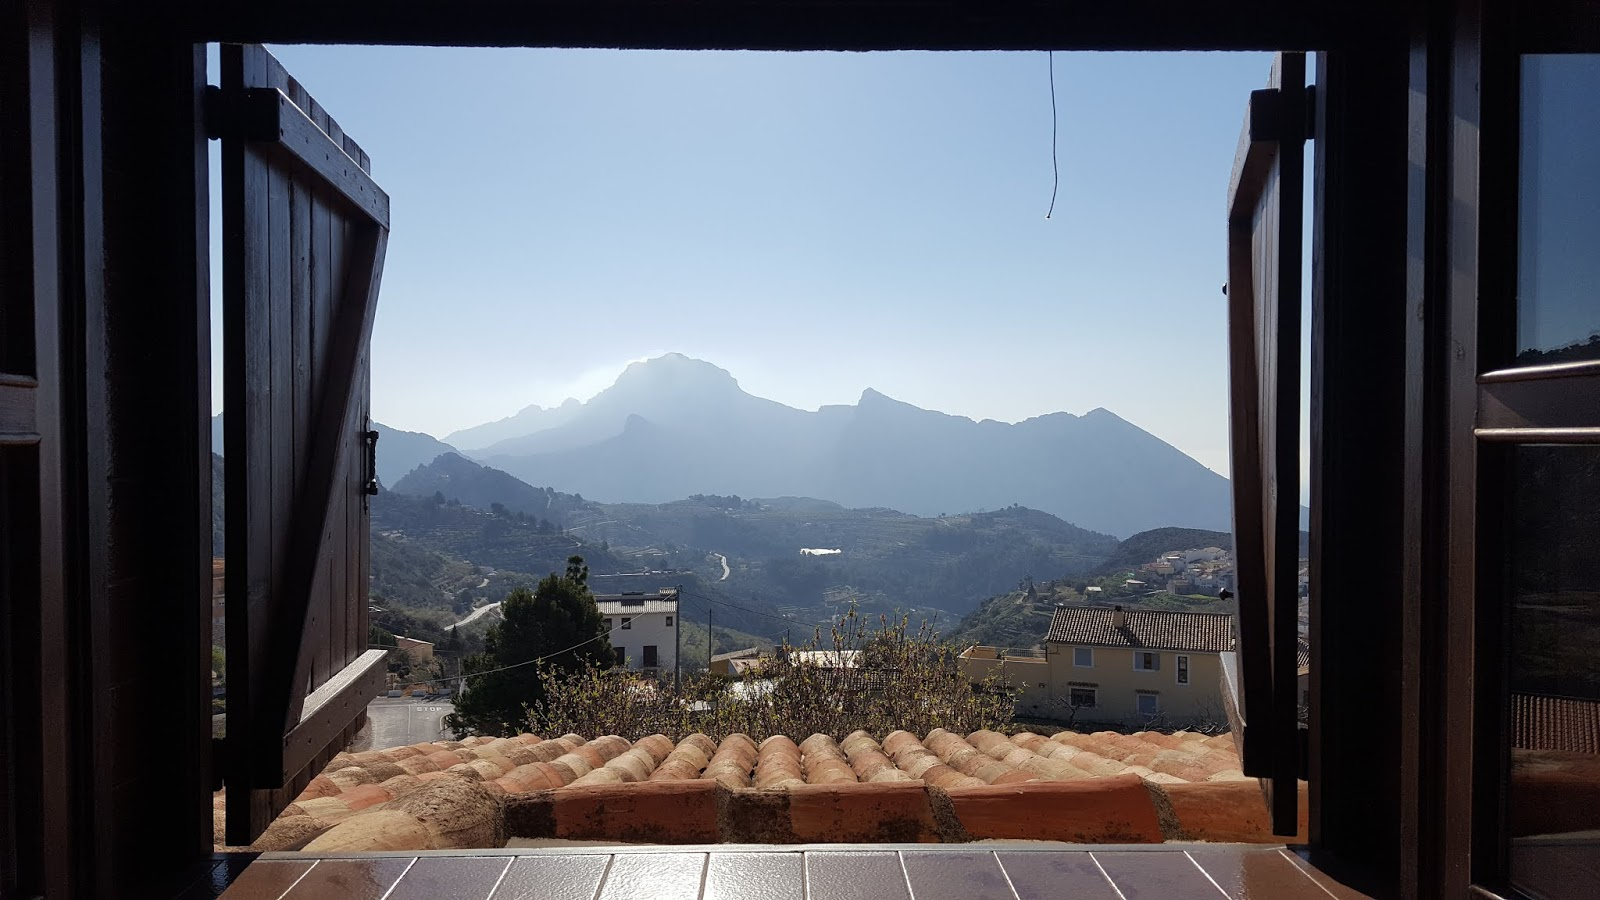 View of Sierra de Bernia from La Panavista, Tárbena, Alicante